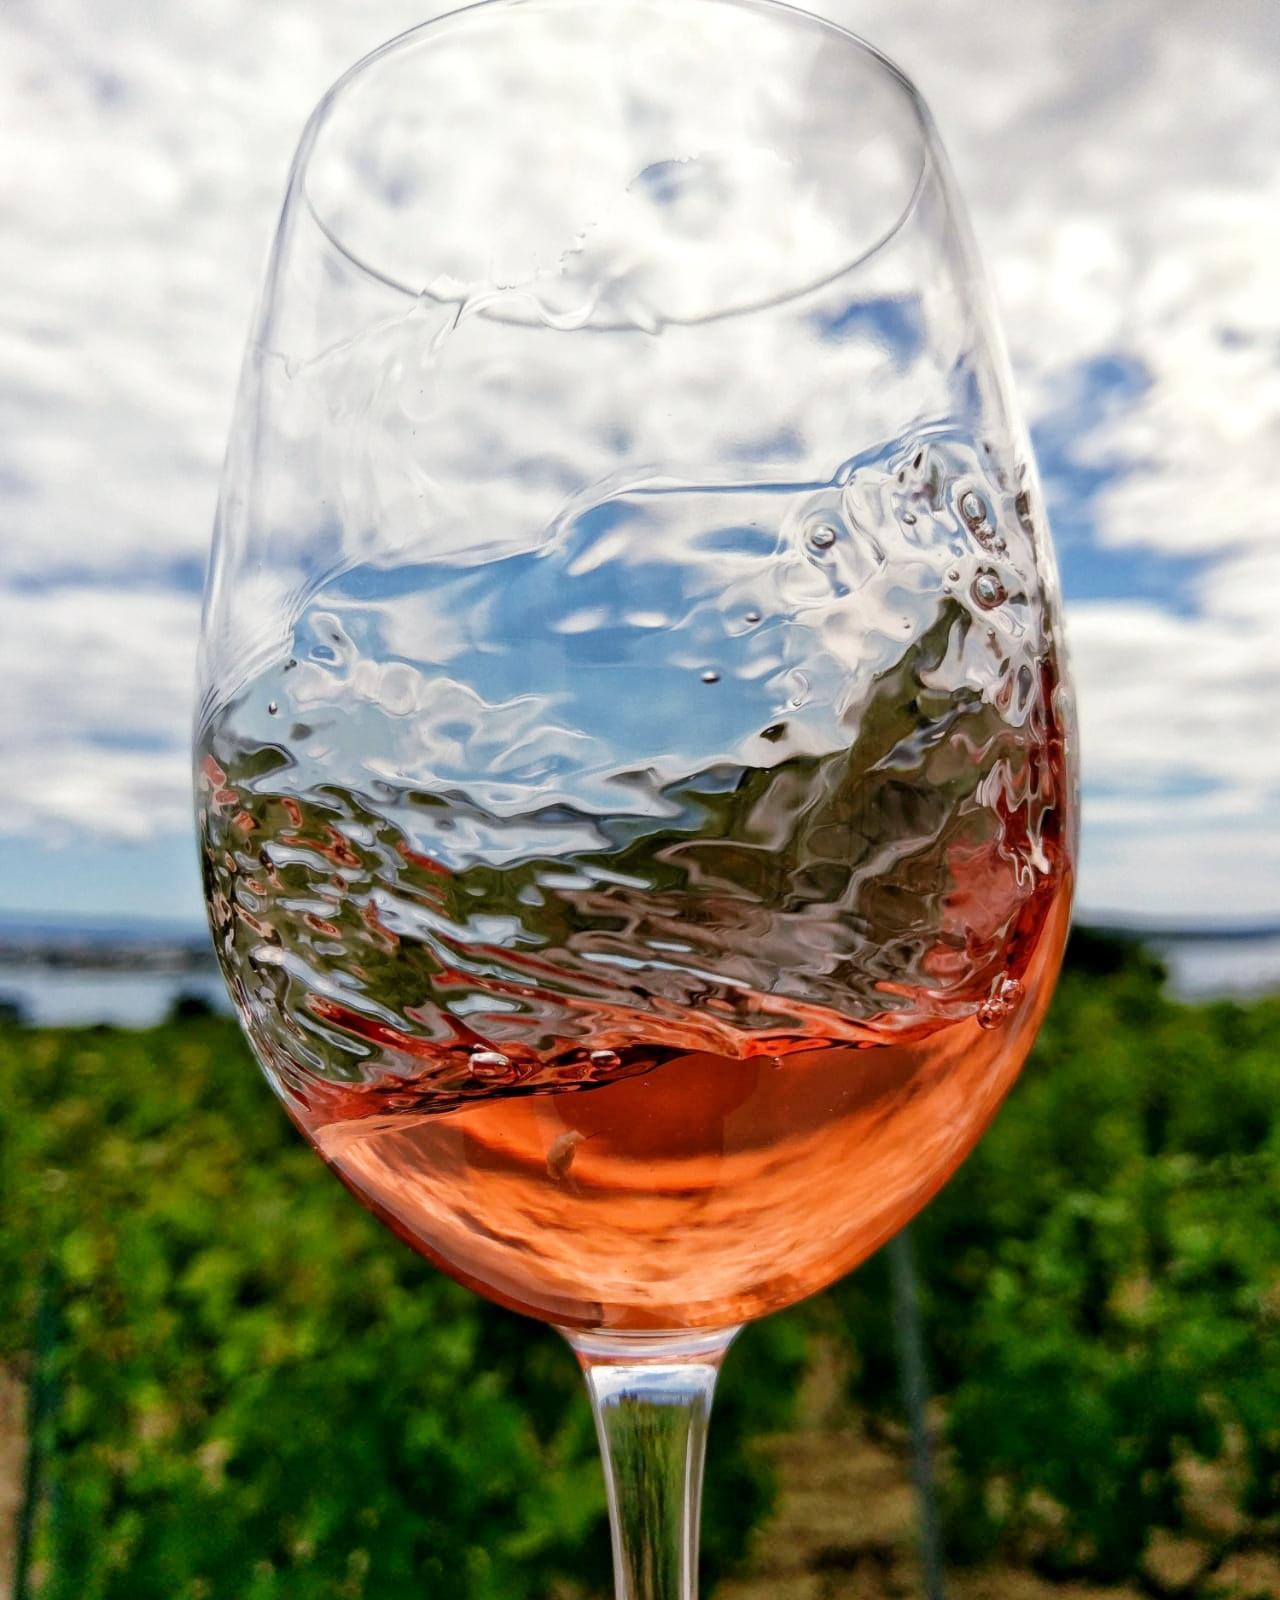 Putalj Rose wine in glass